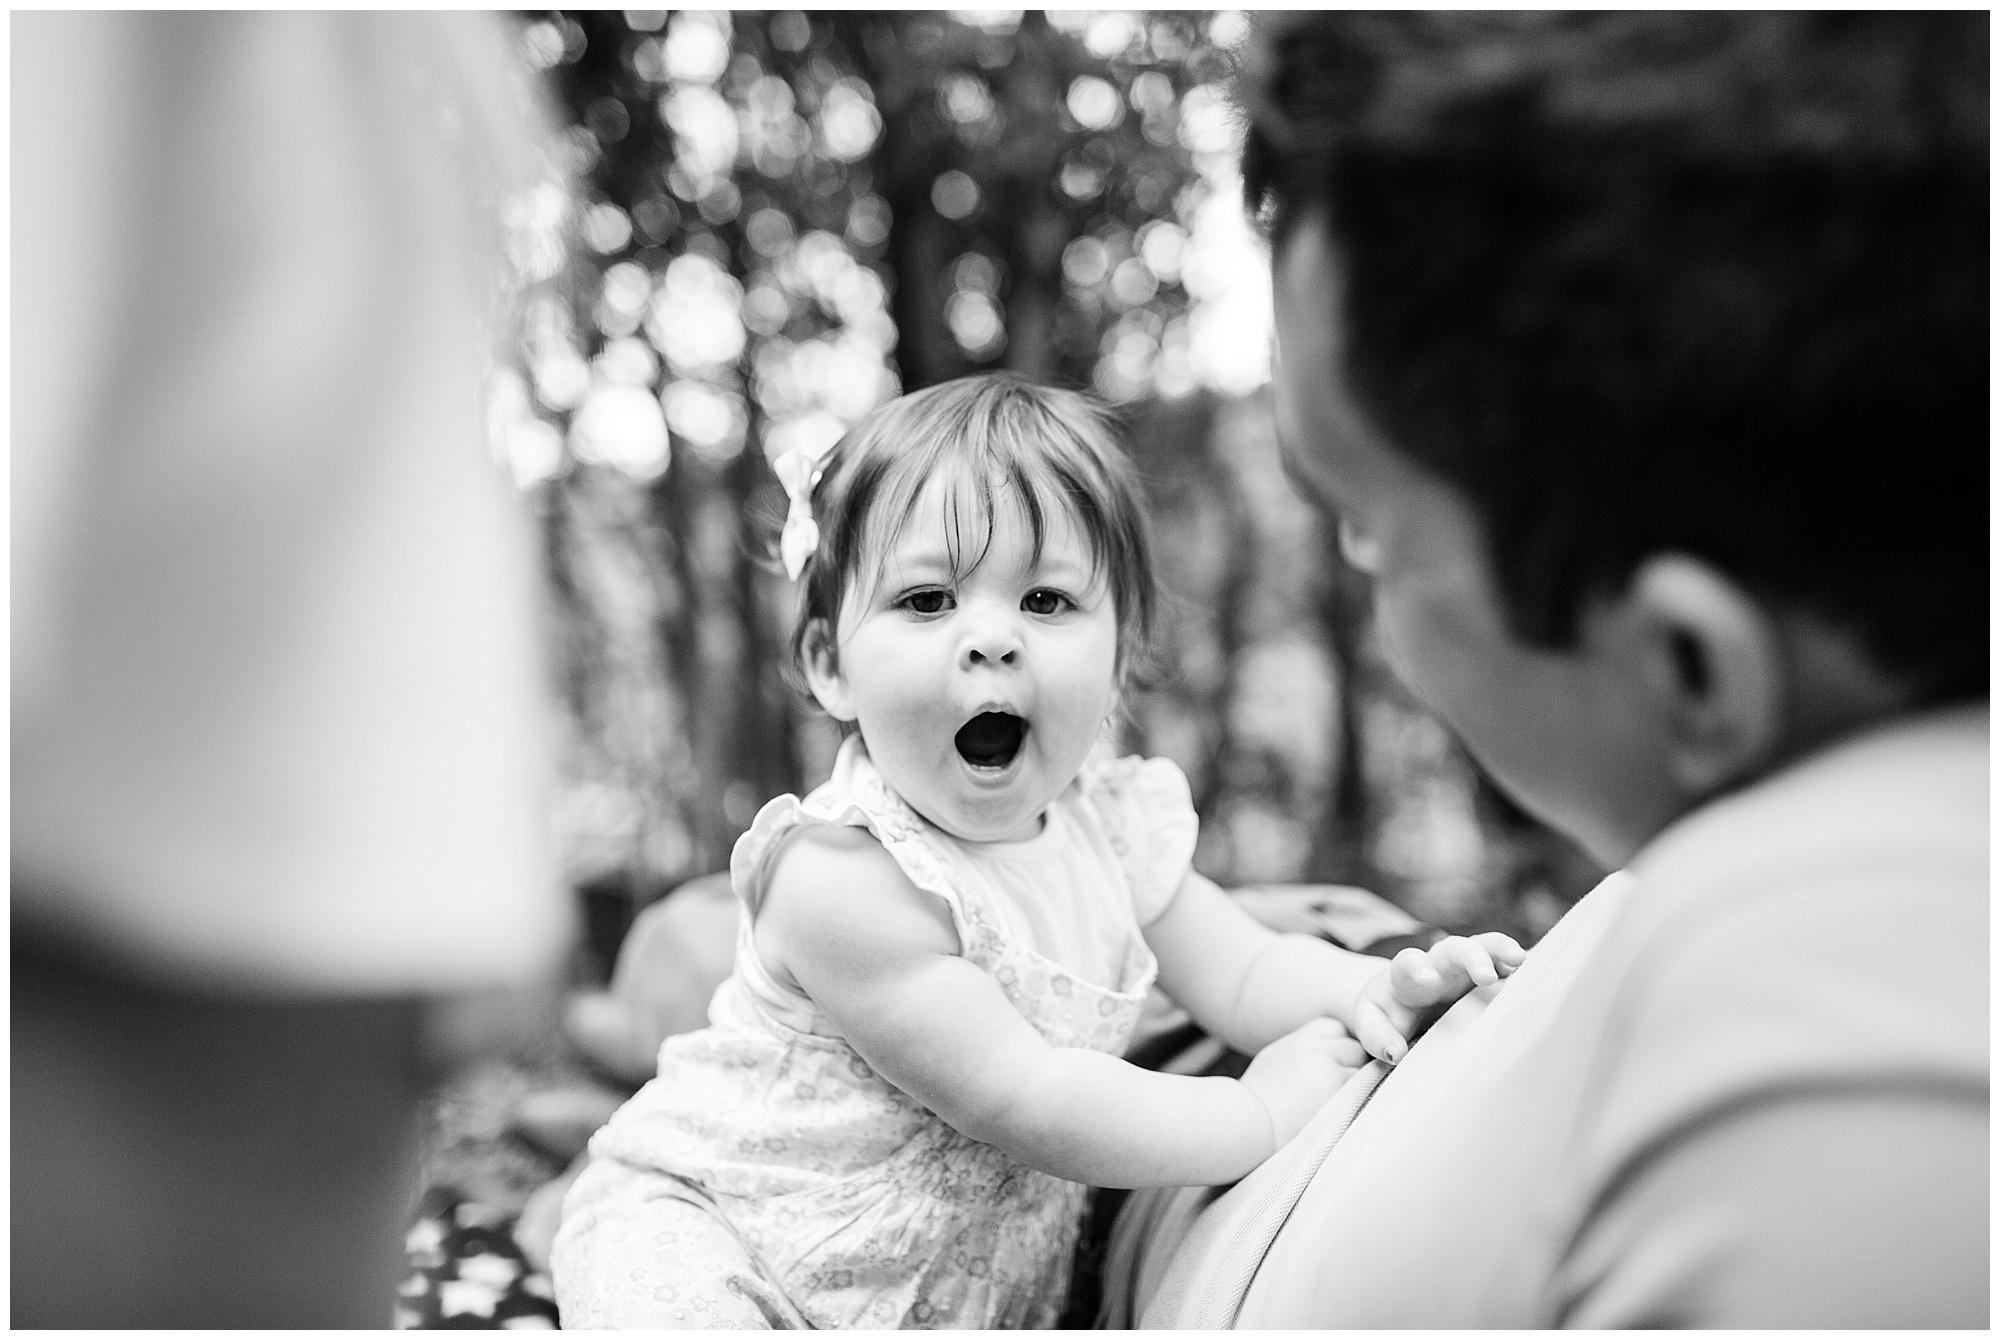 black and white photo of 1 year old girl yawning